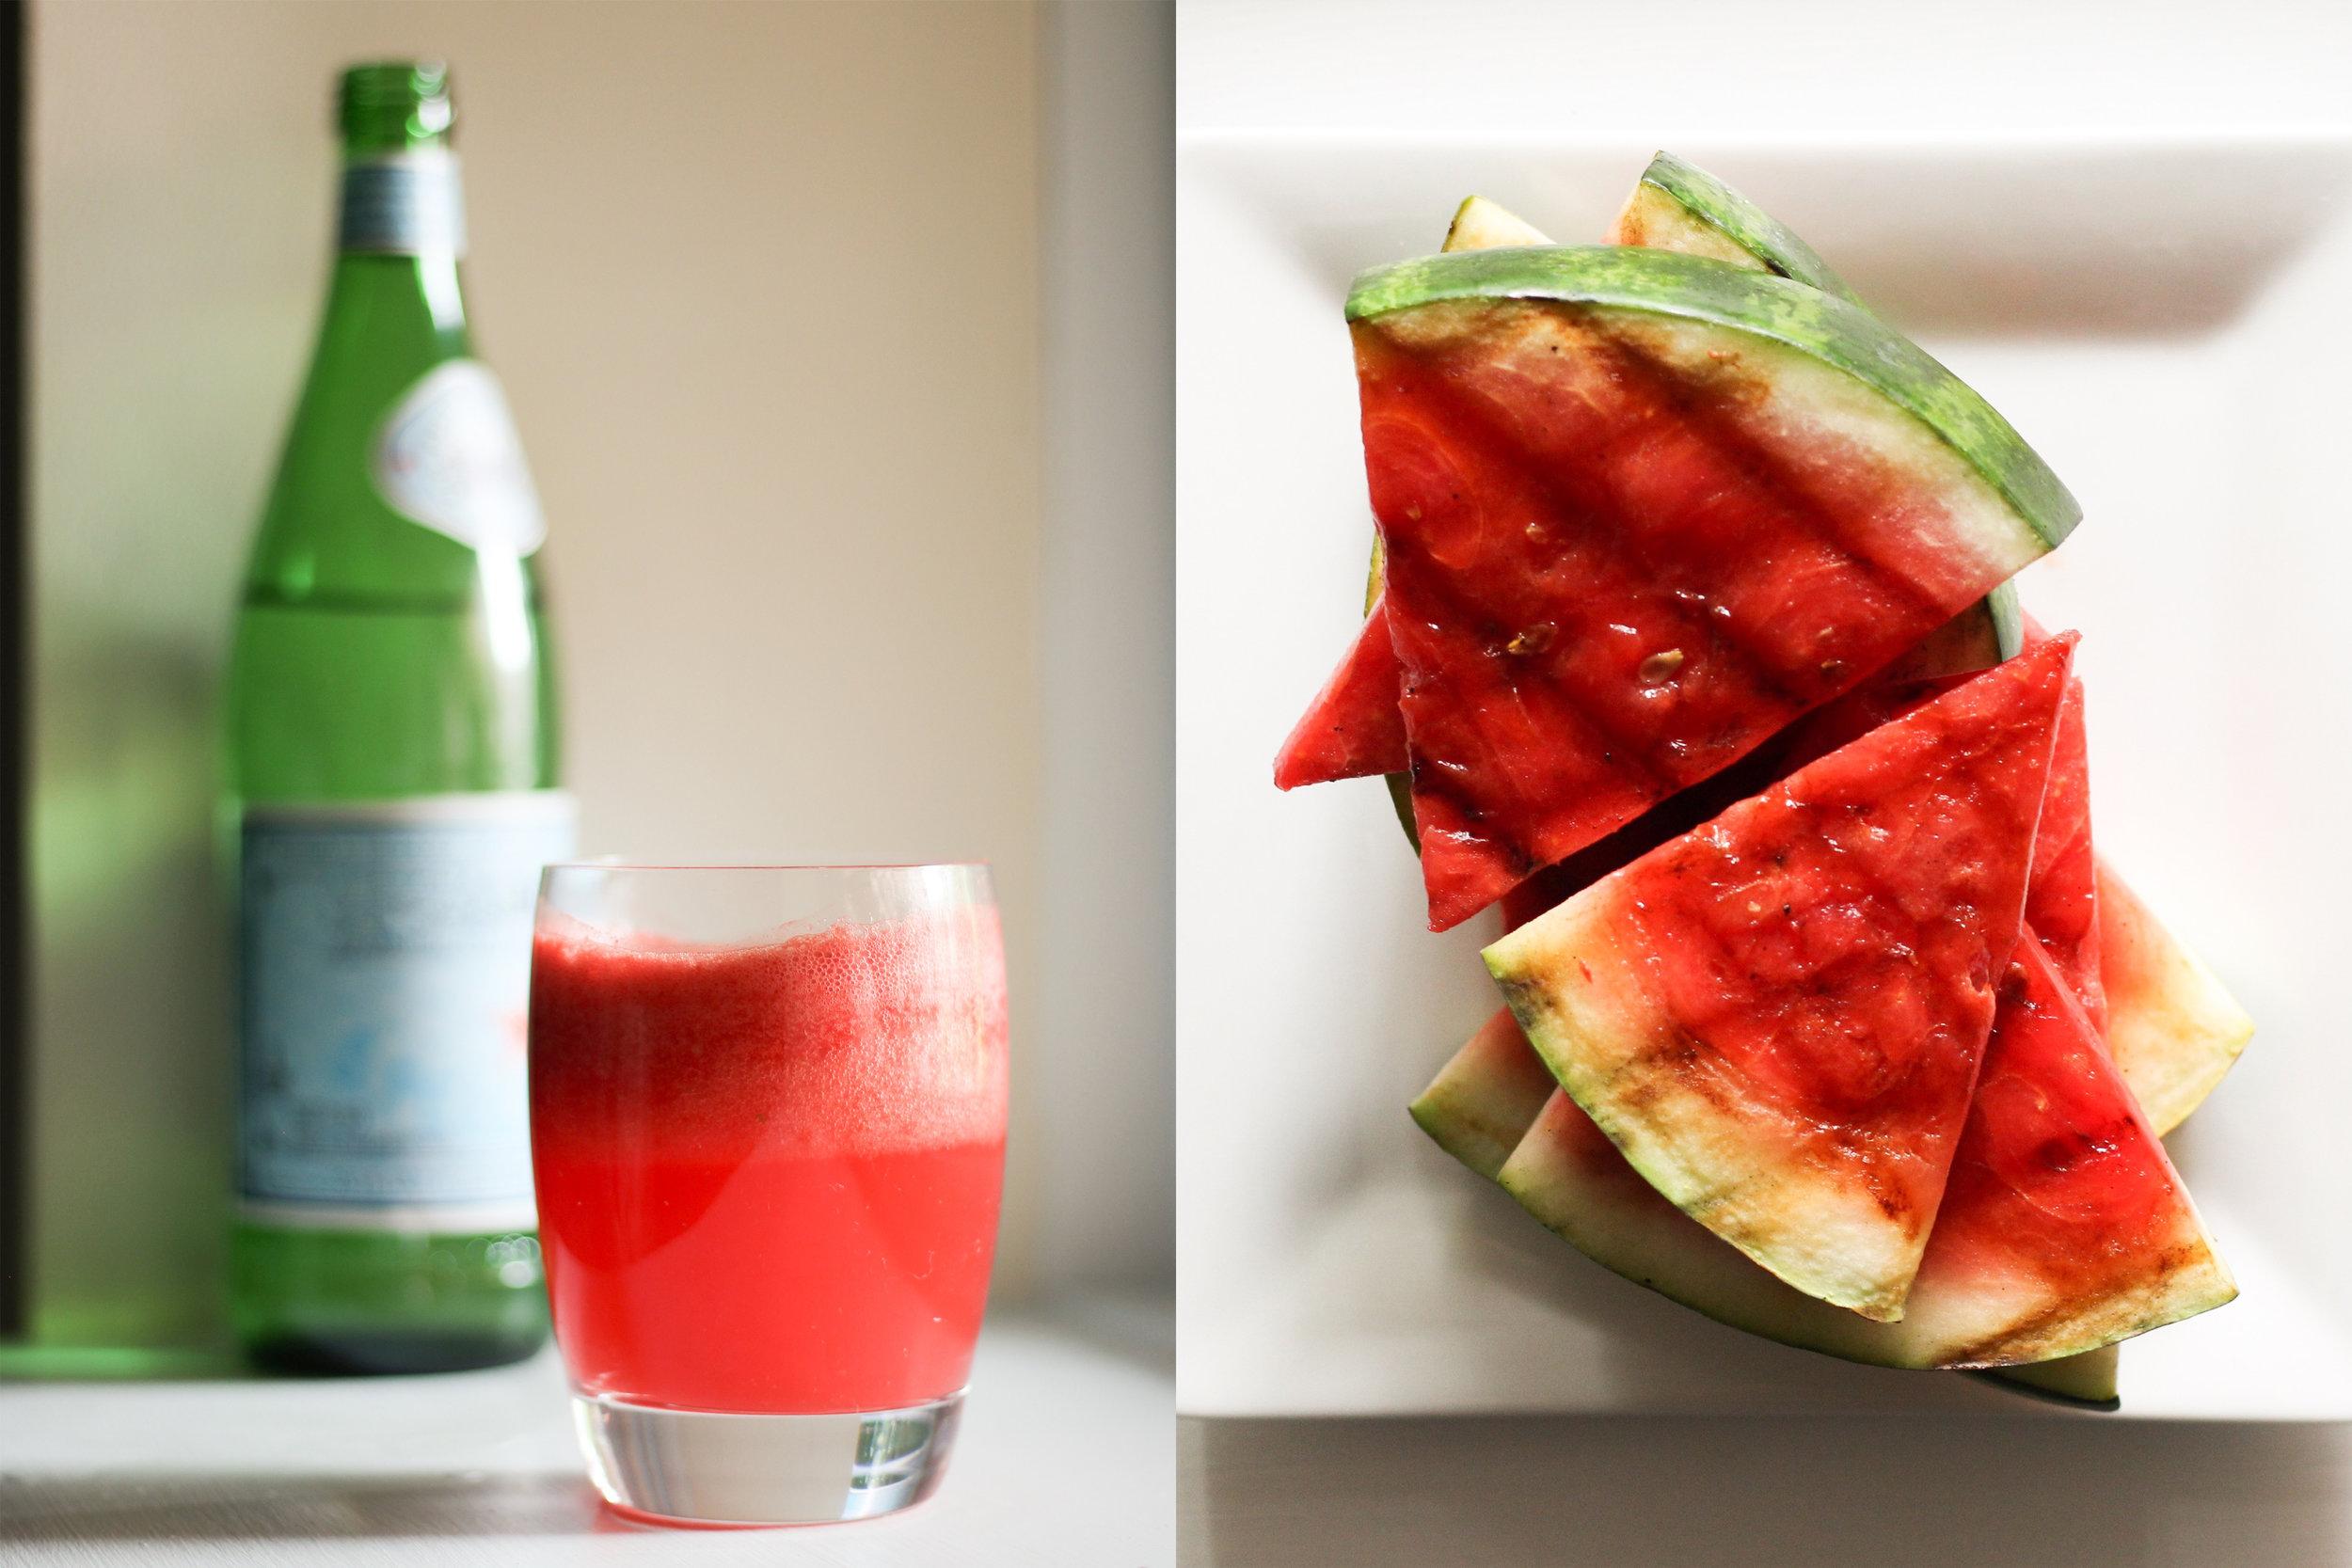 agua fresca & grilled melon